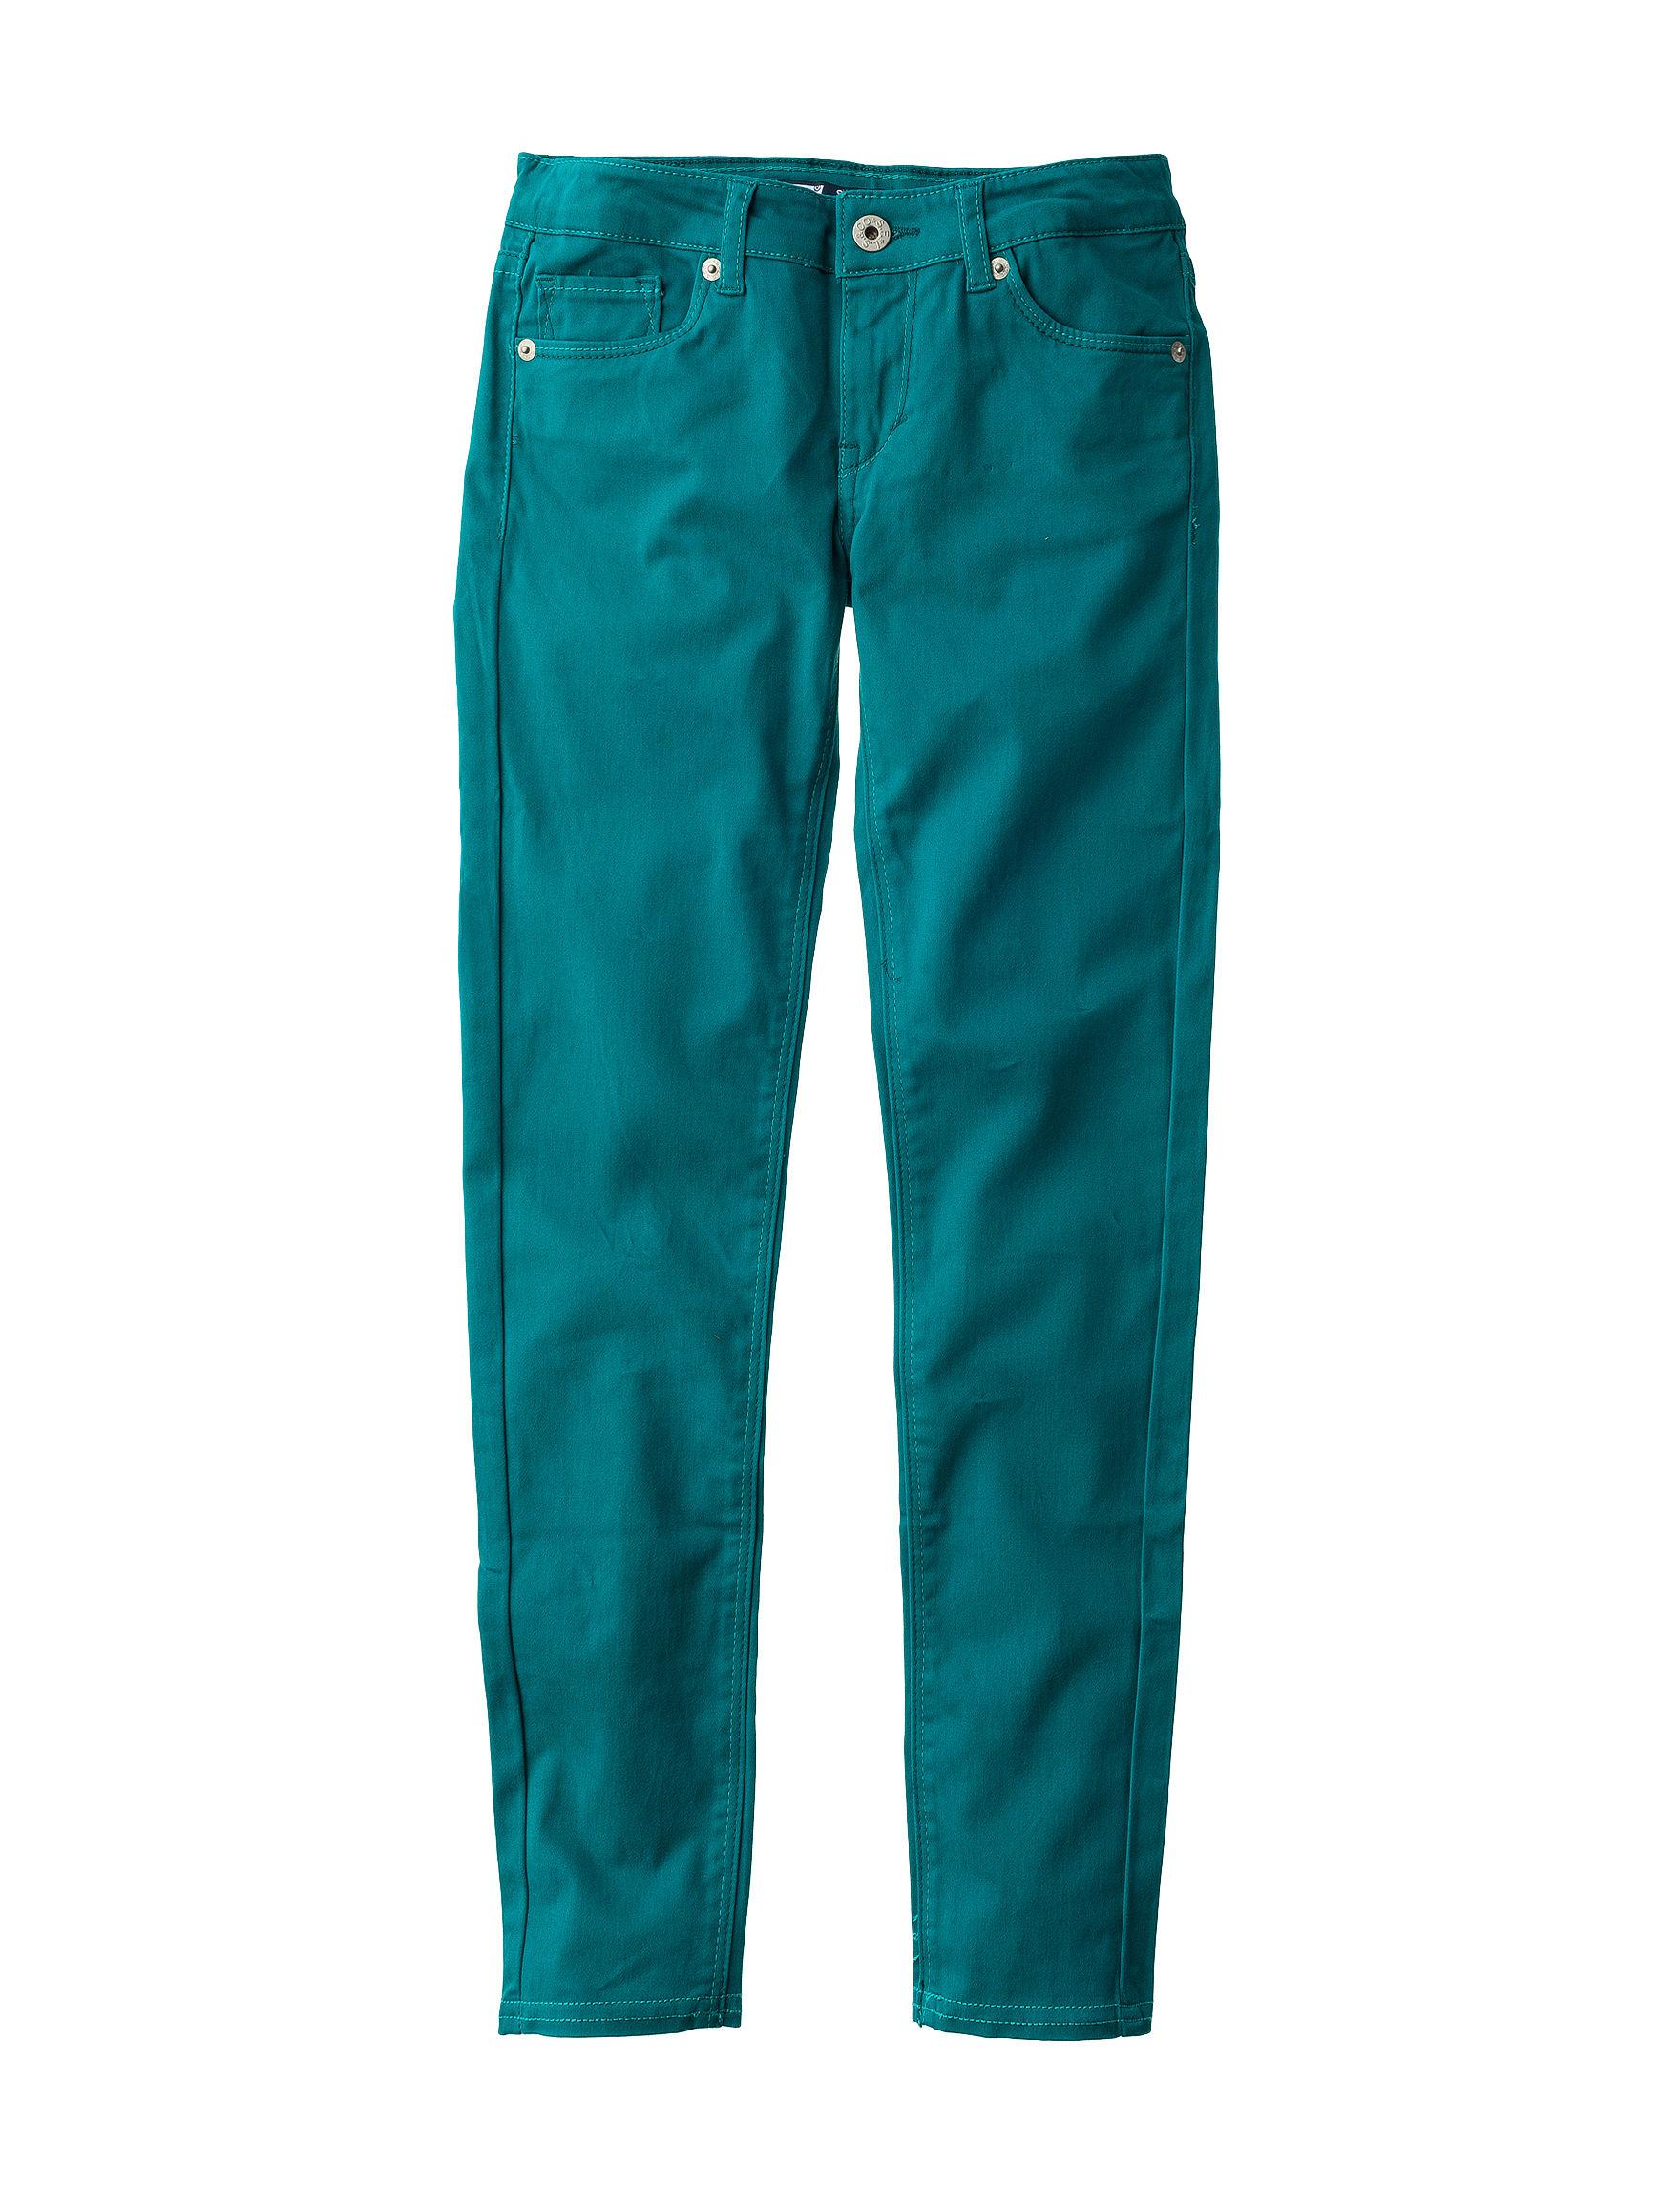 Levi's Turquoise Skinny